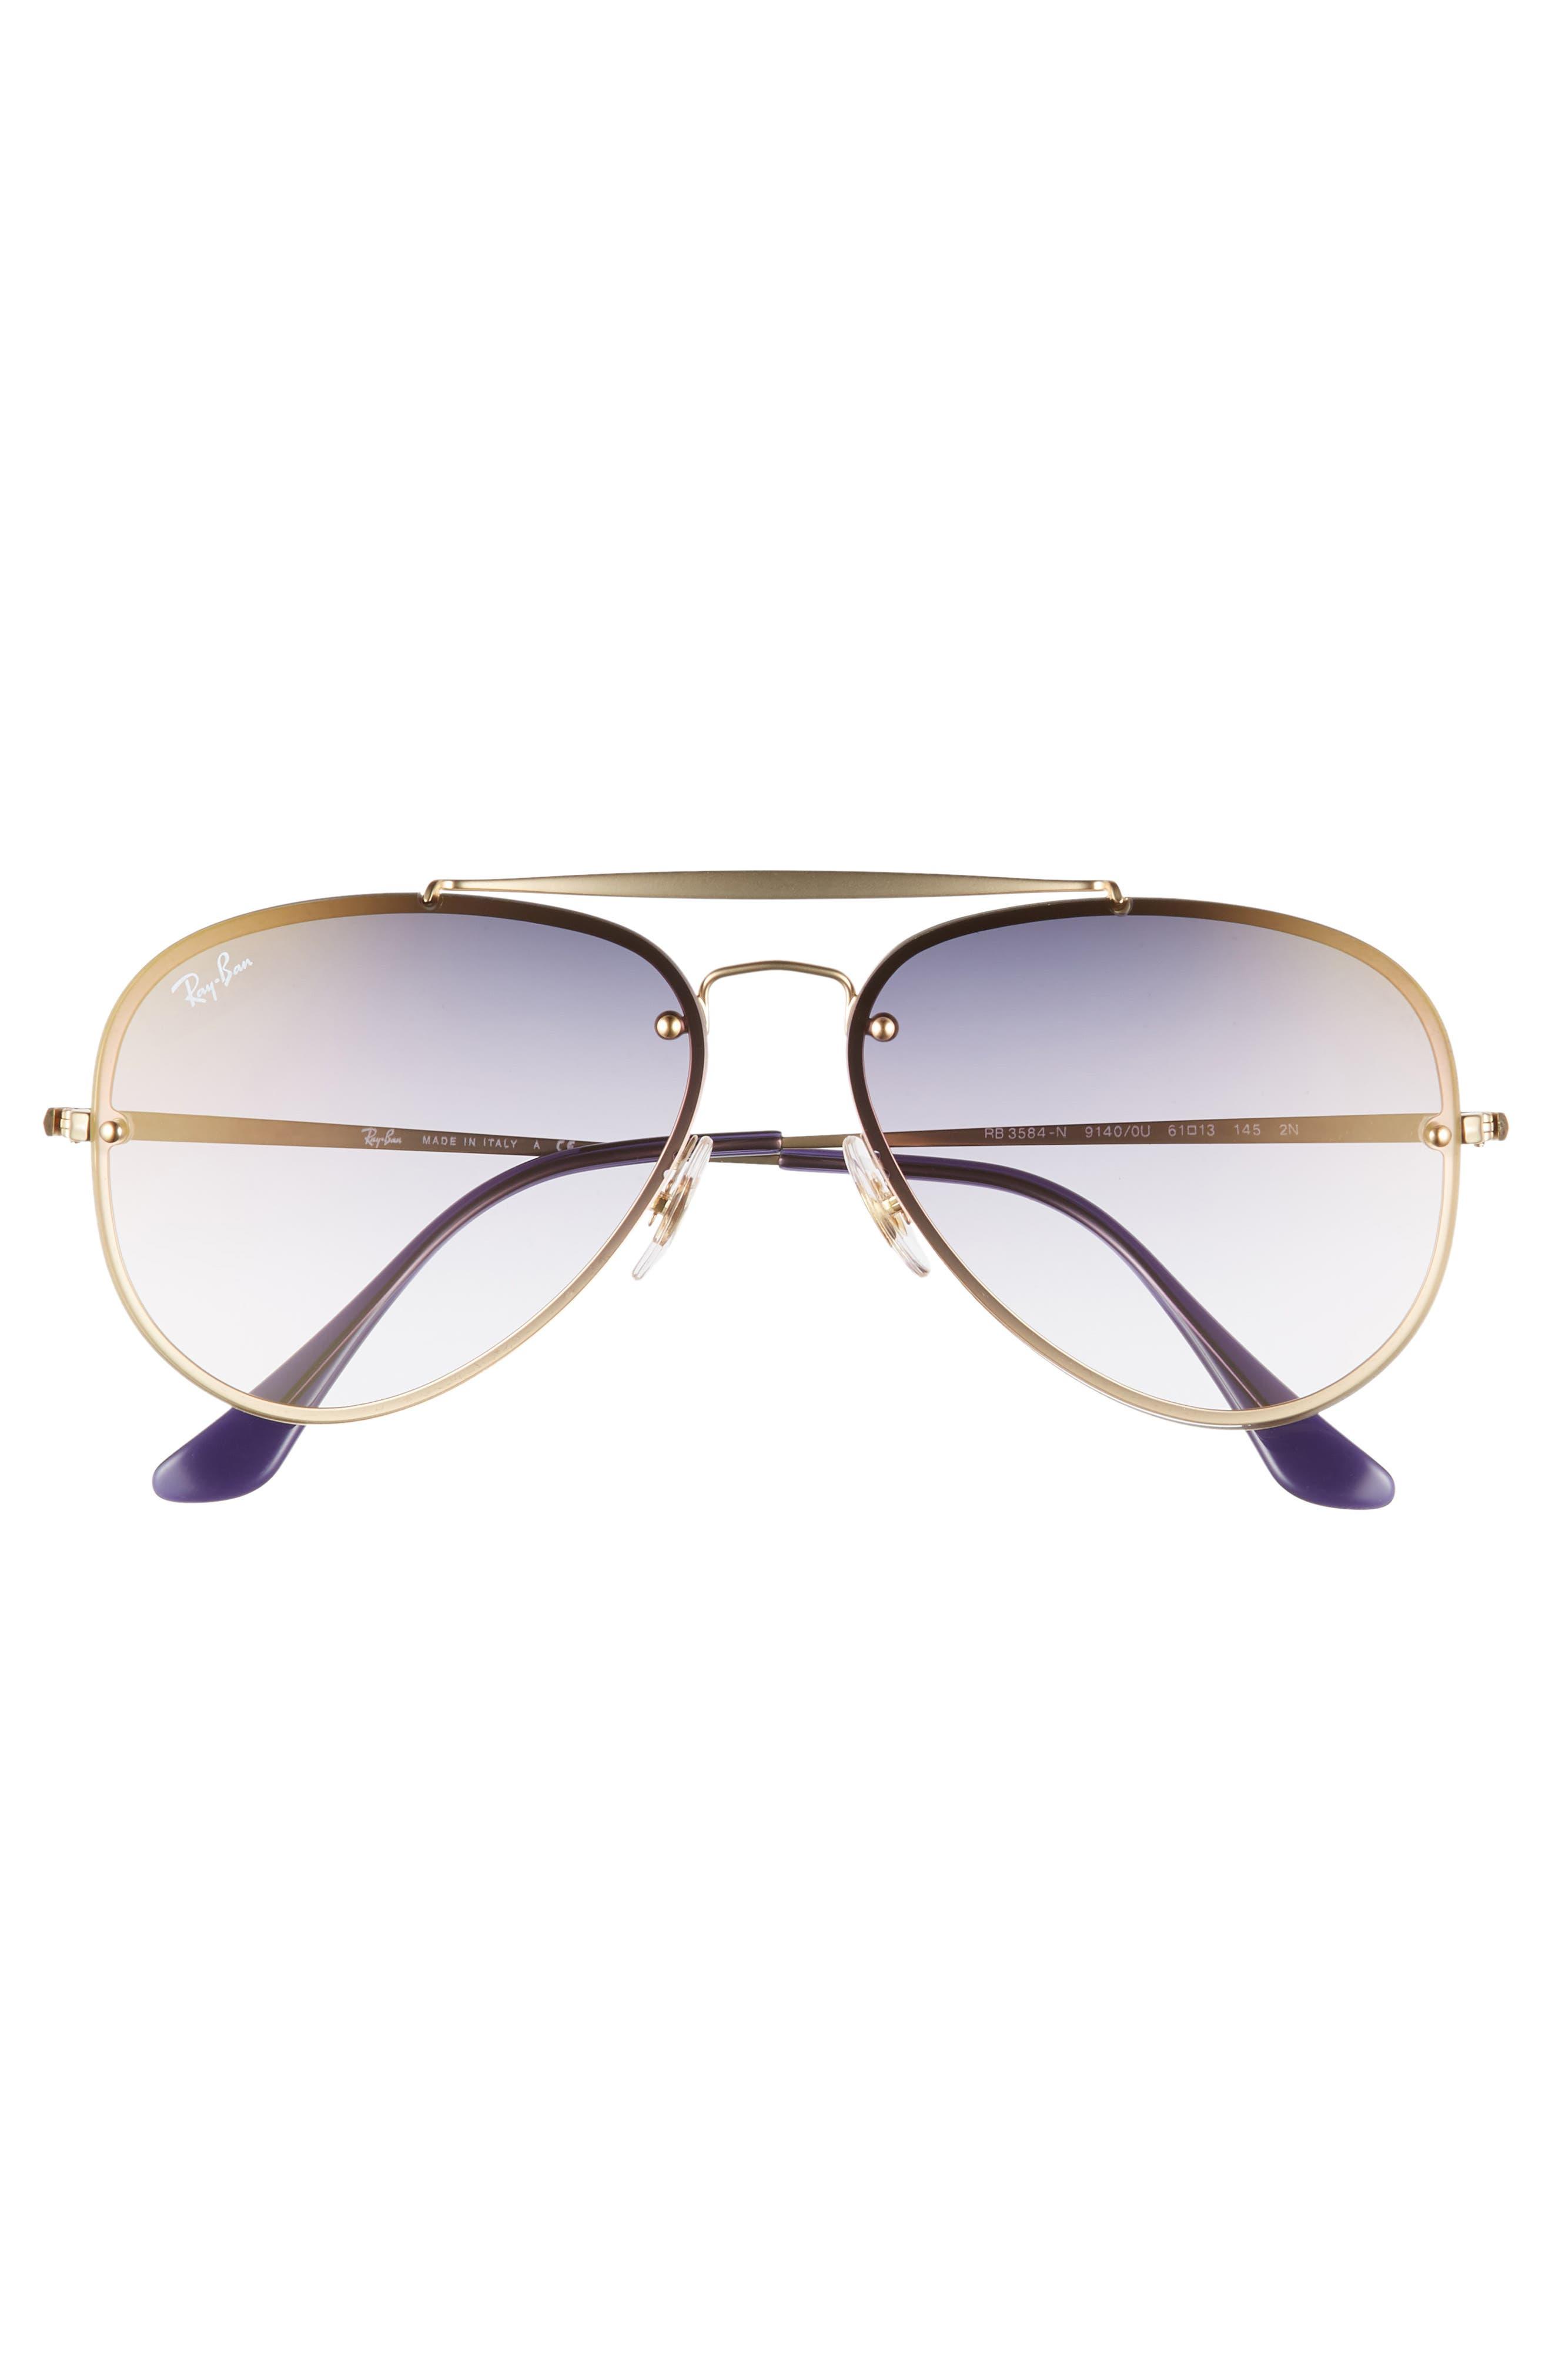 61mm Mirrored Lens Aviator Sunglasses,                             Alternate thumbnail 3, color,                             GOLD/ BLUE VIOLET GRADIENT